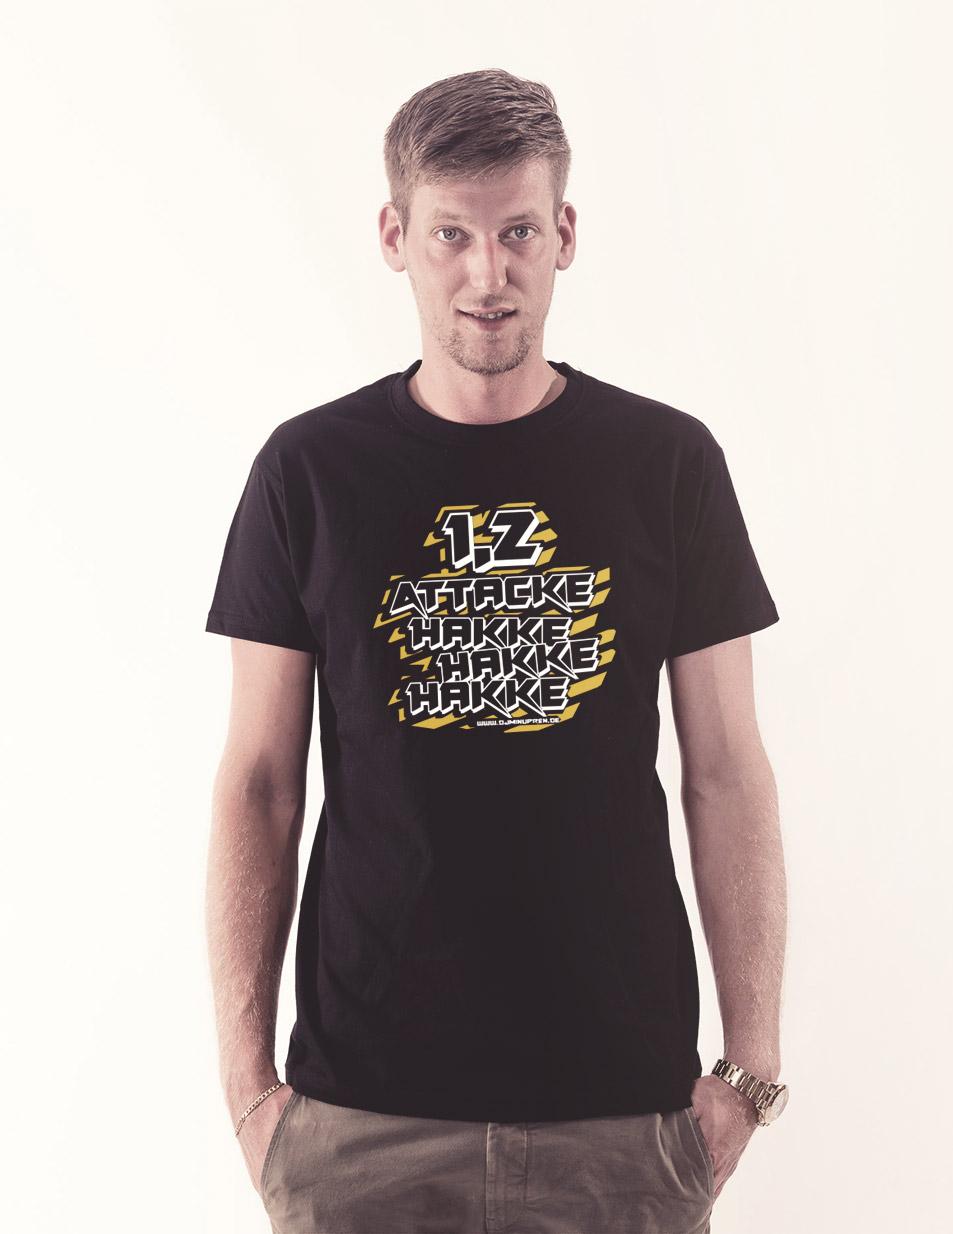 Hakke Hakke Hakke T-Shirt mehrfarbig auf schwarz